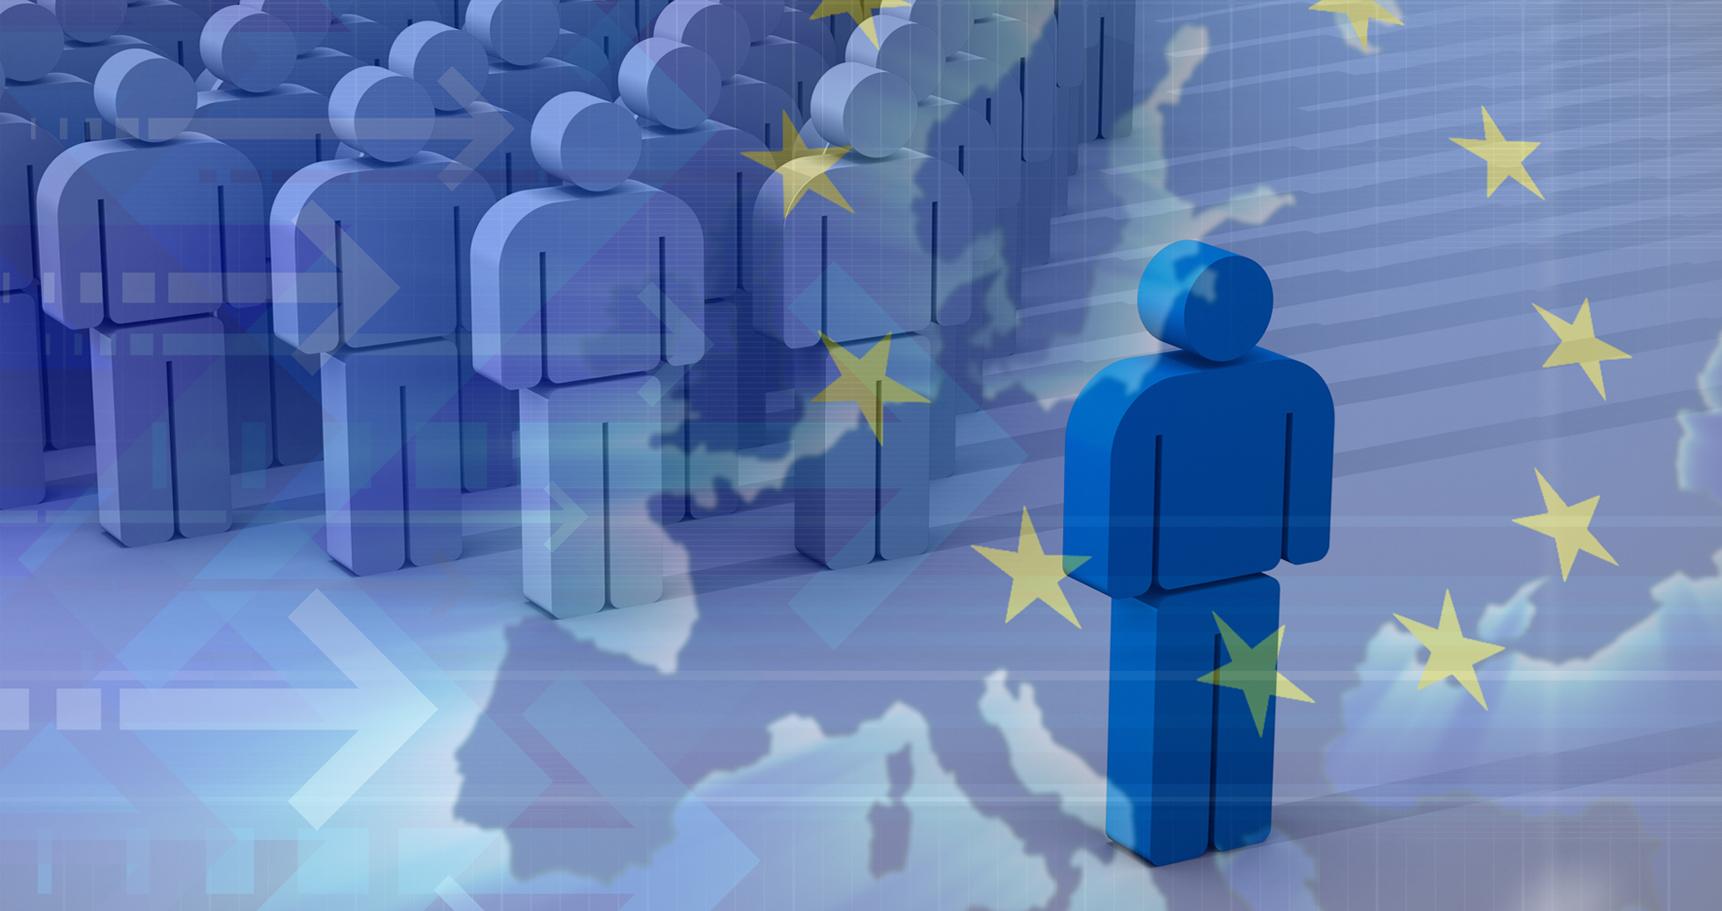 Matrix-EU-Sammelklagen